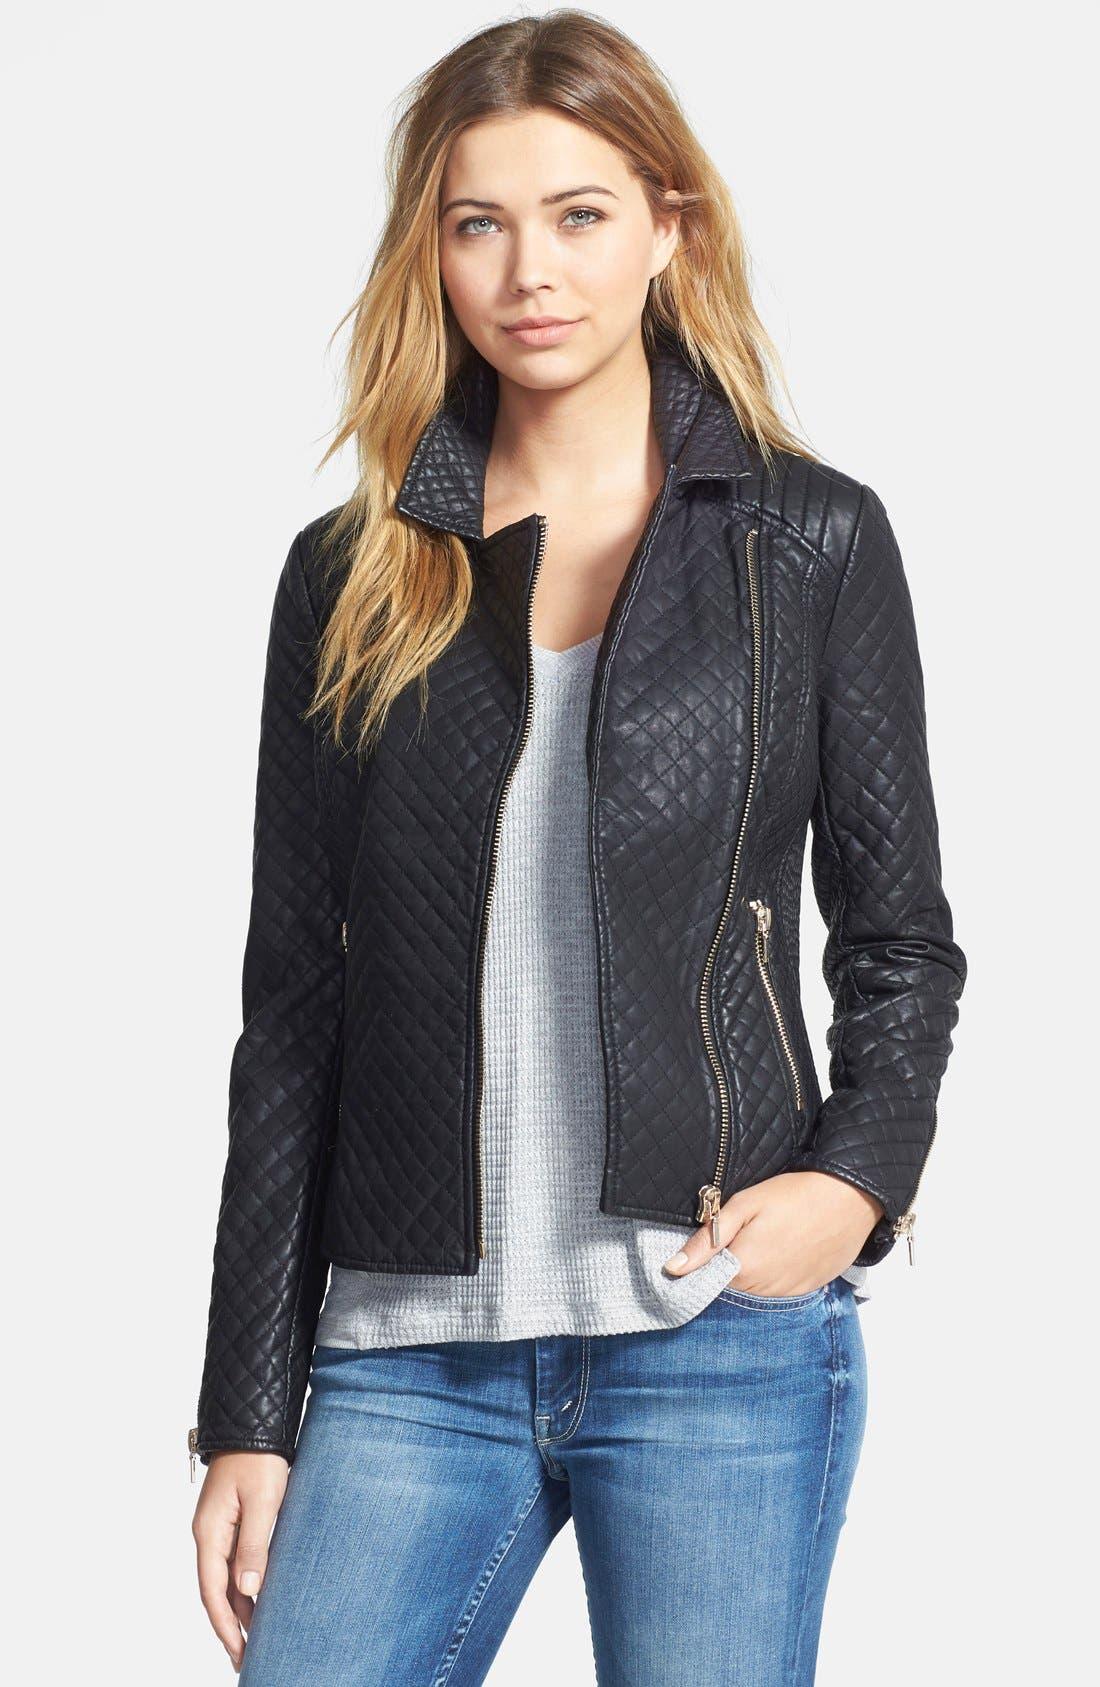 Main Image - STELLA + LORENZO Faux Leather Jacket